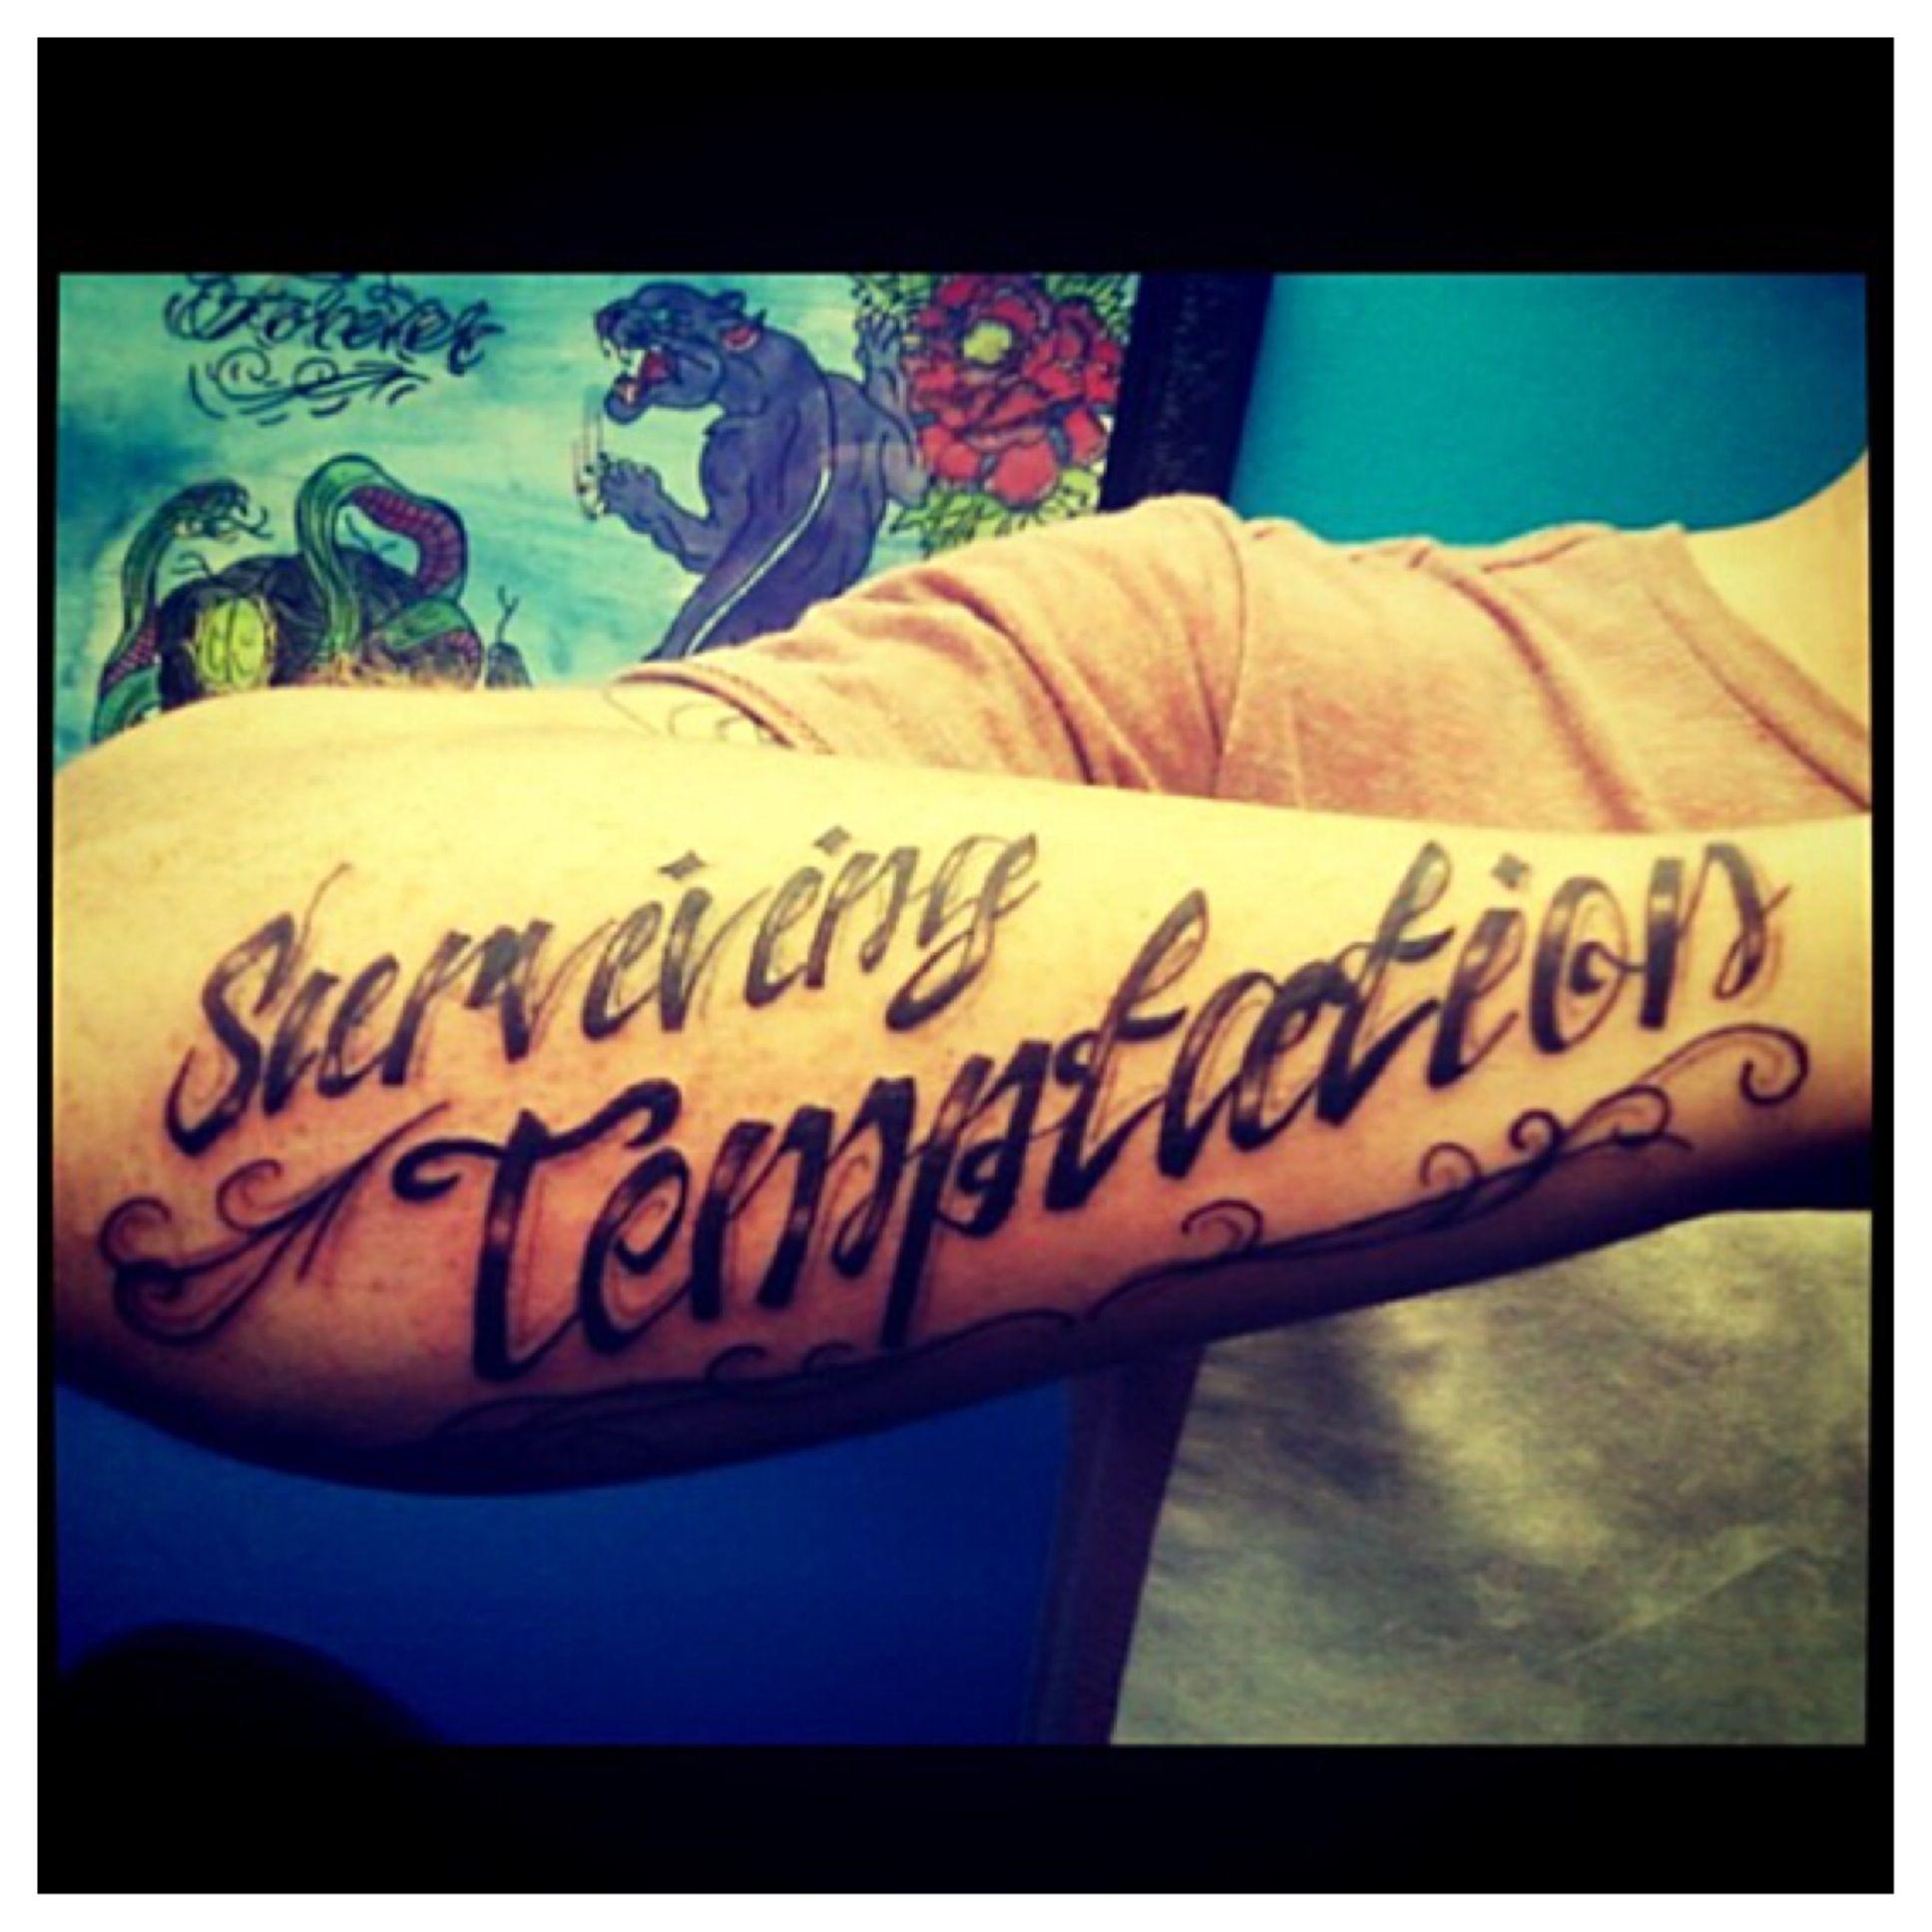 Christian tattoo artists indianapolis